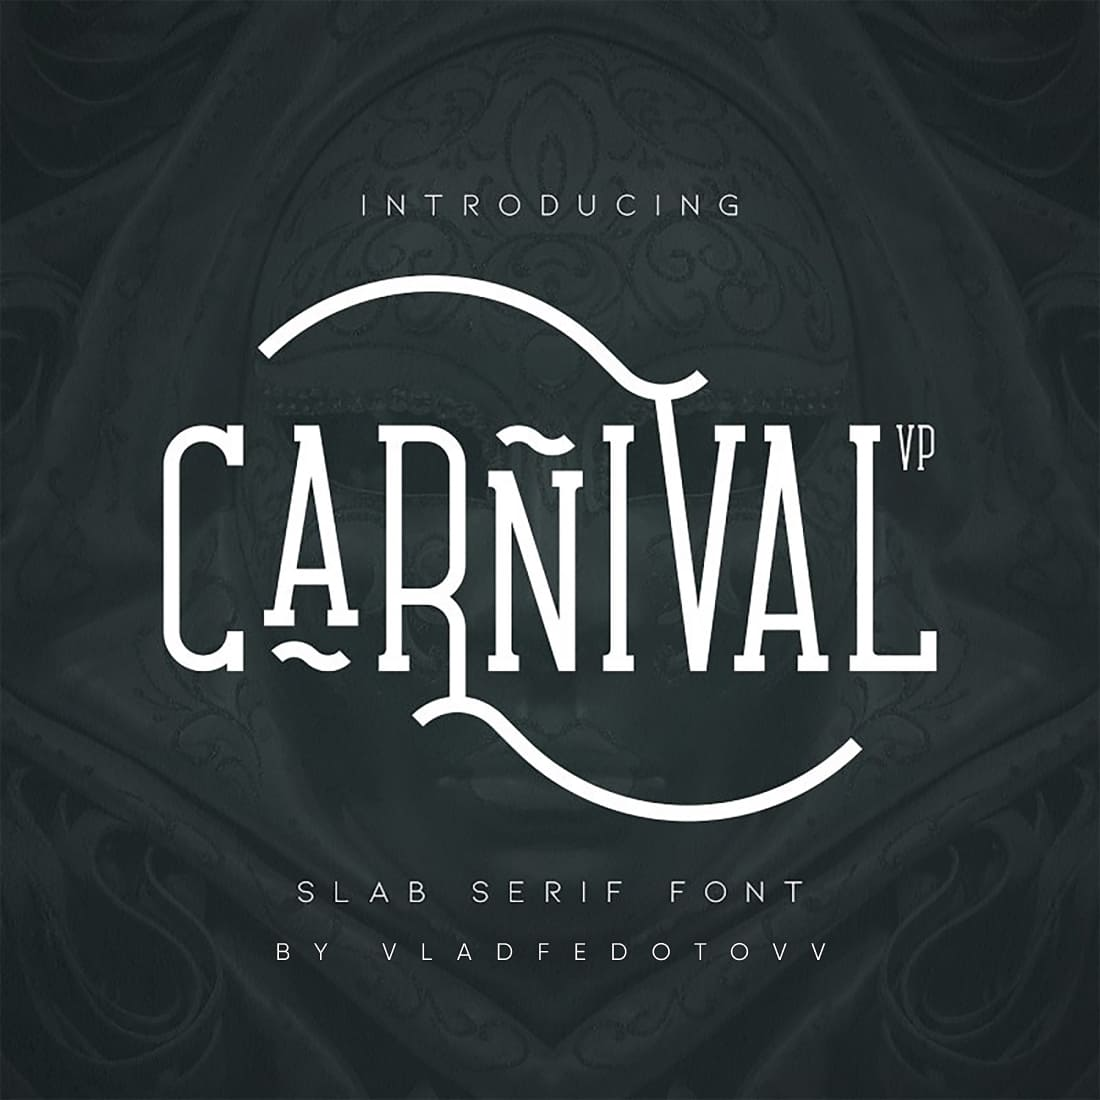 Carnival VP Slab Font – Latin Cyrillic cover image.